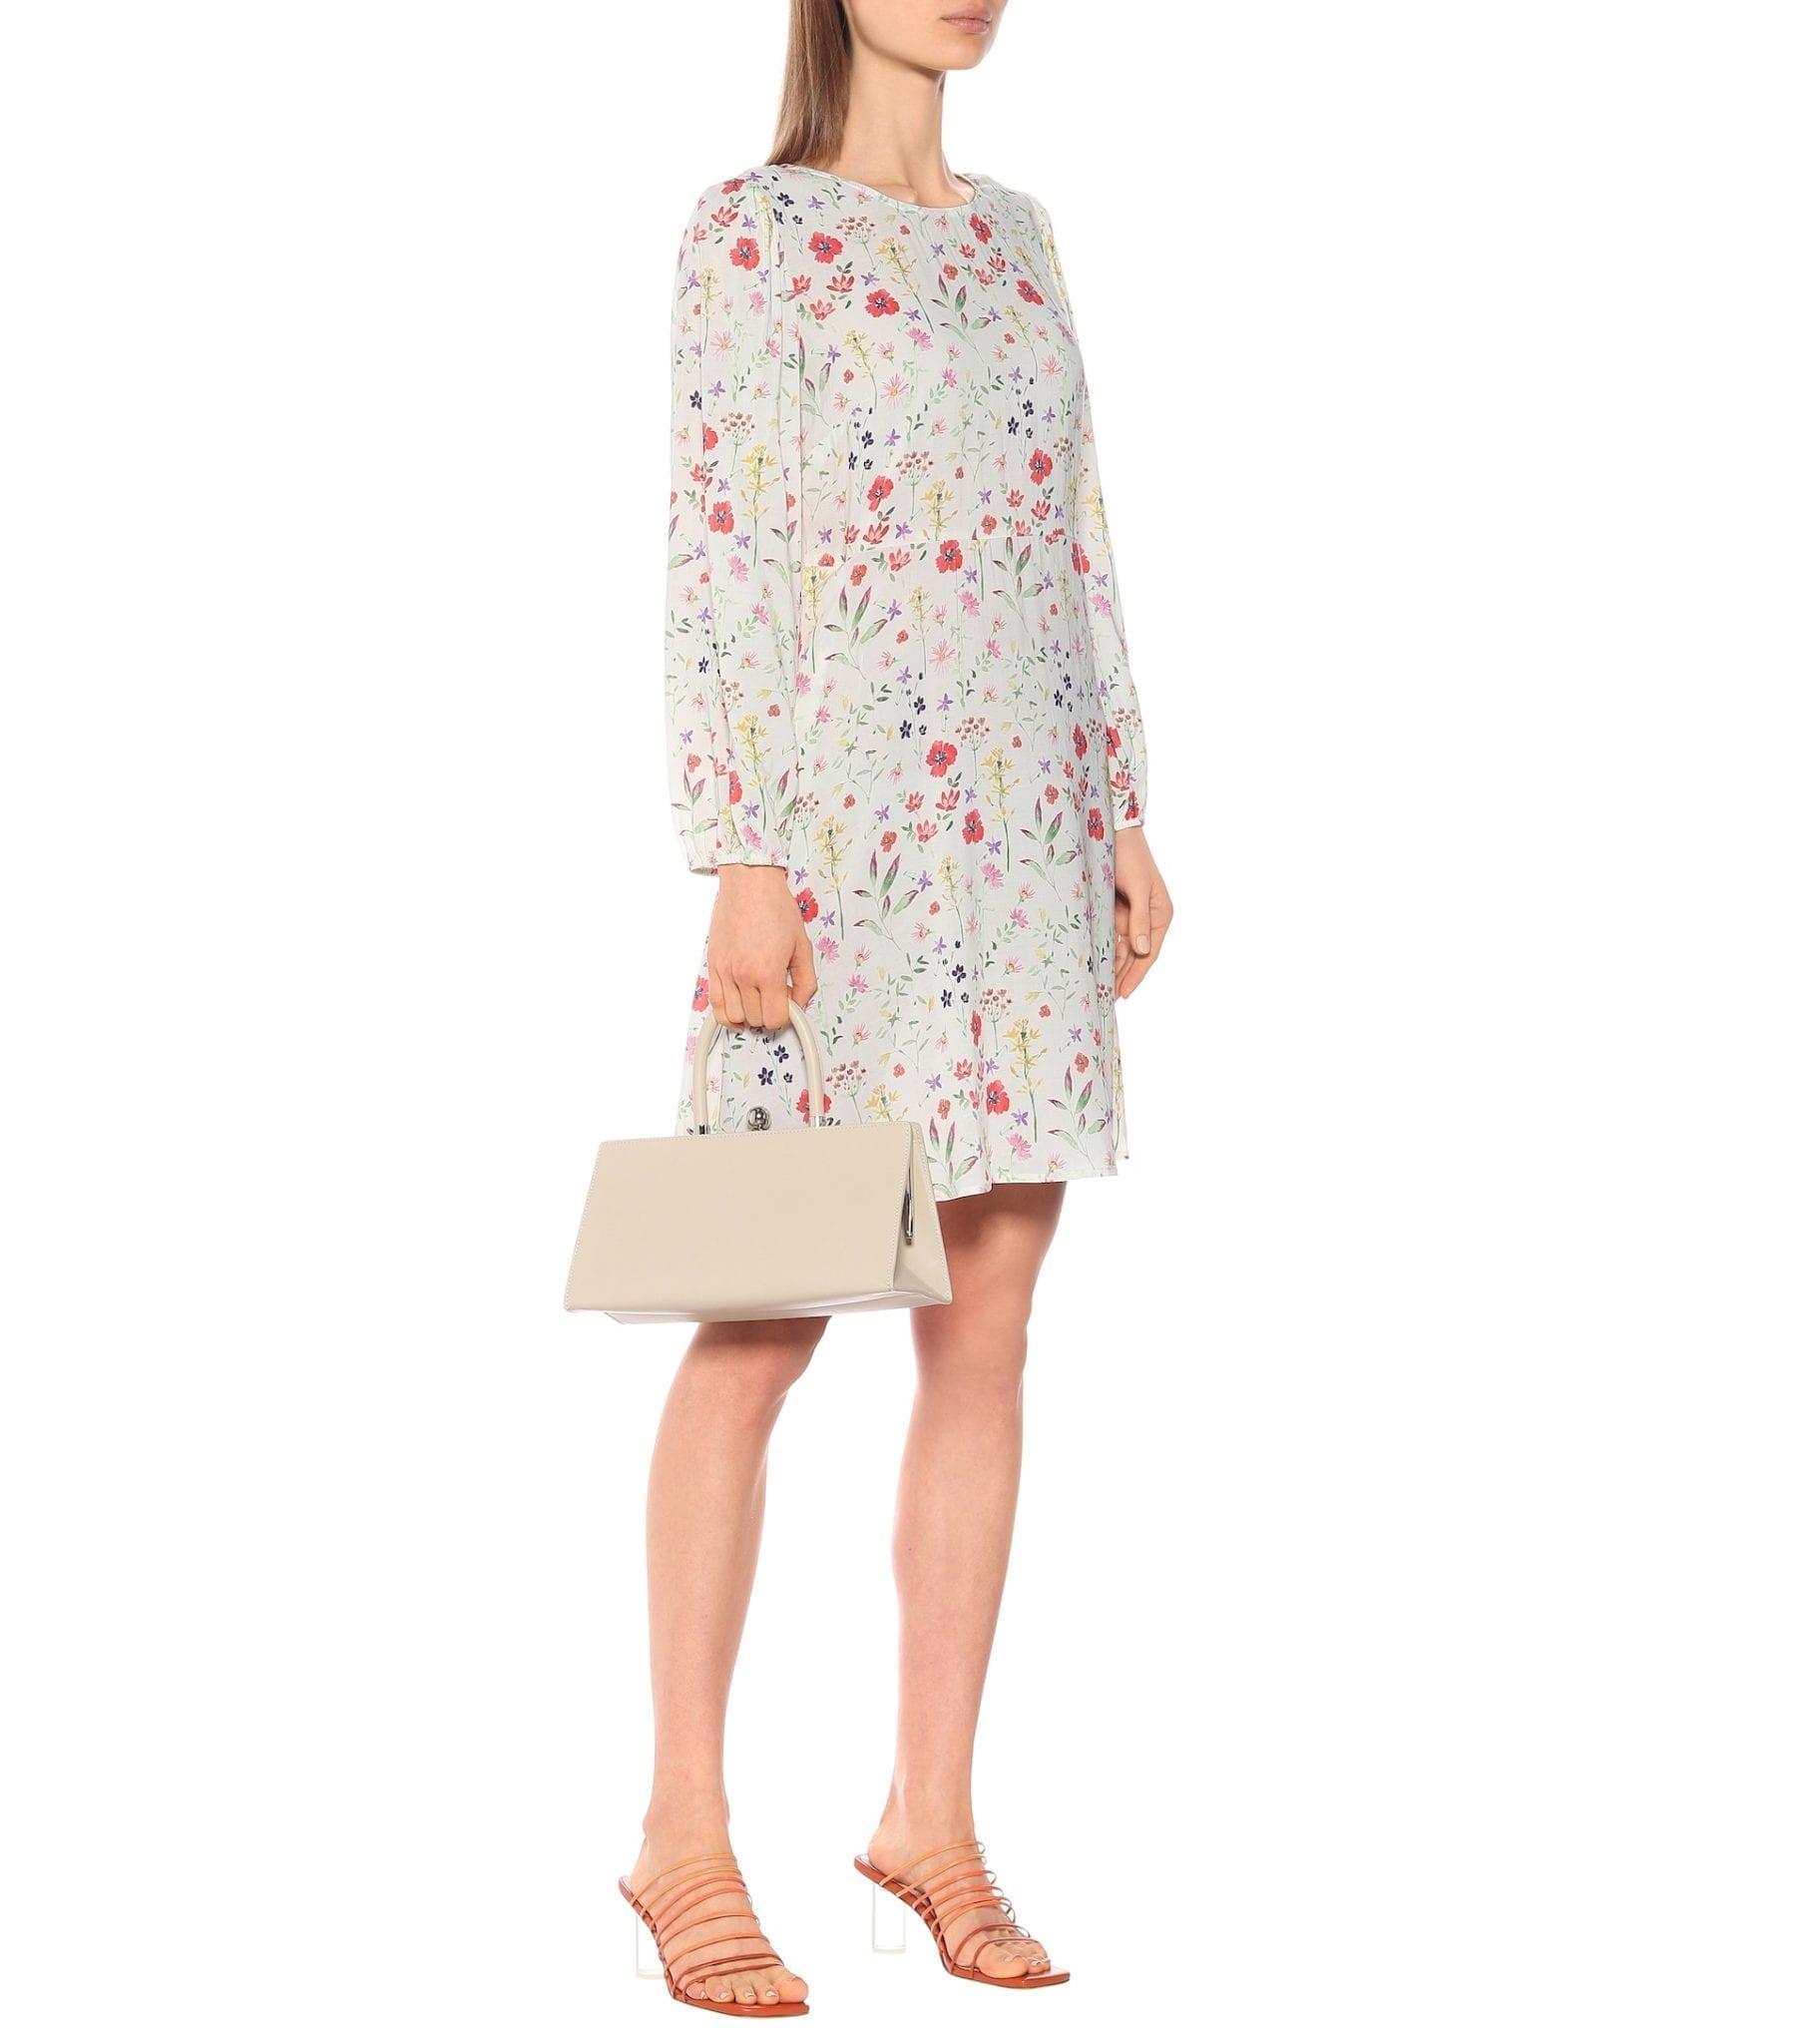 VELVET Exclusive To Mytheresa – Floral Mini Dress